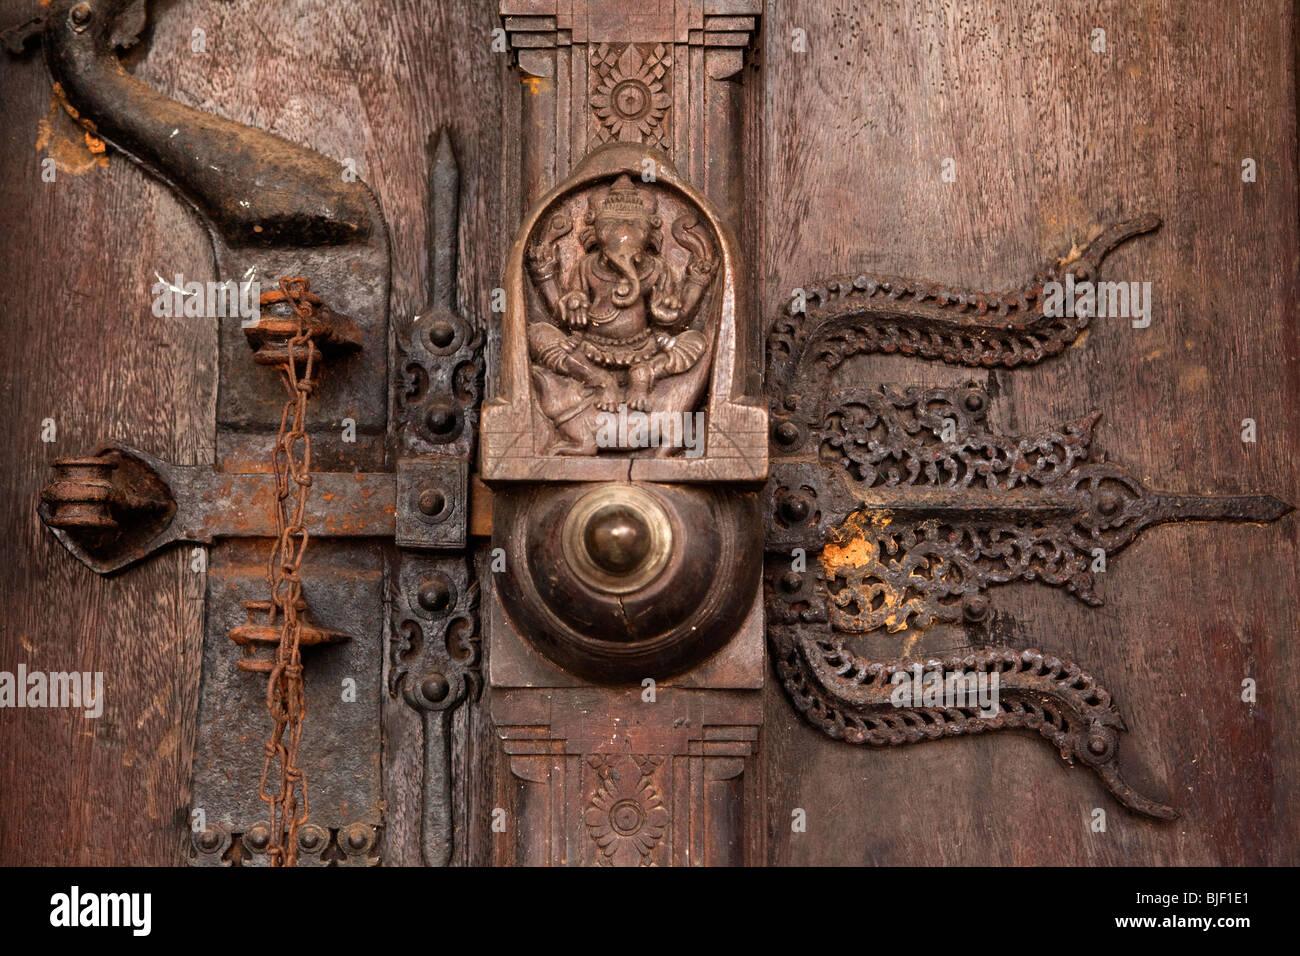 India Kerala Kochi Mattancherry Jewtown Old Iron And